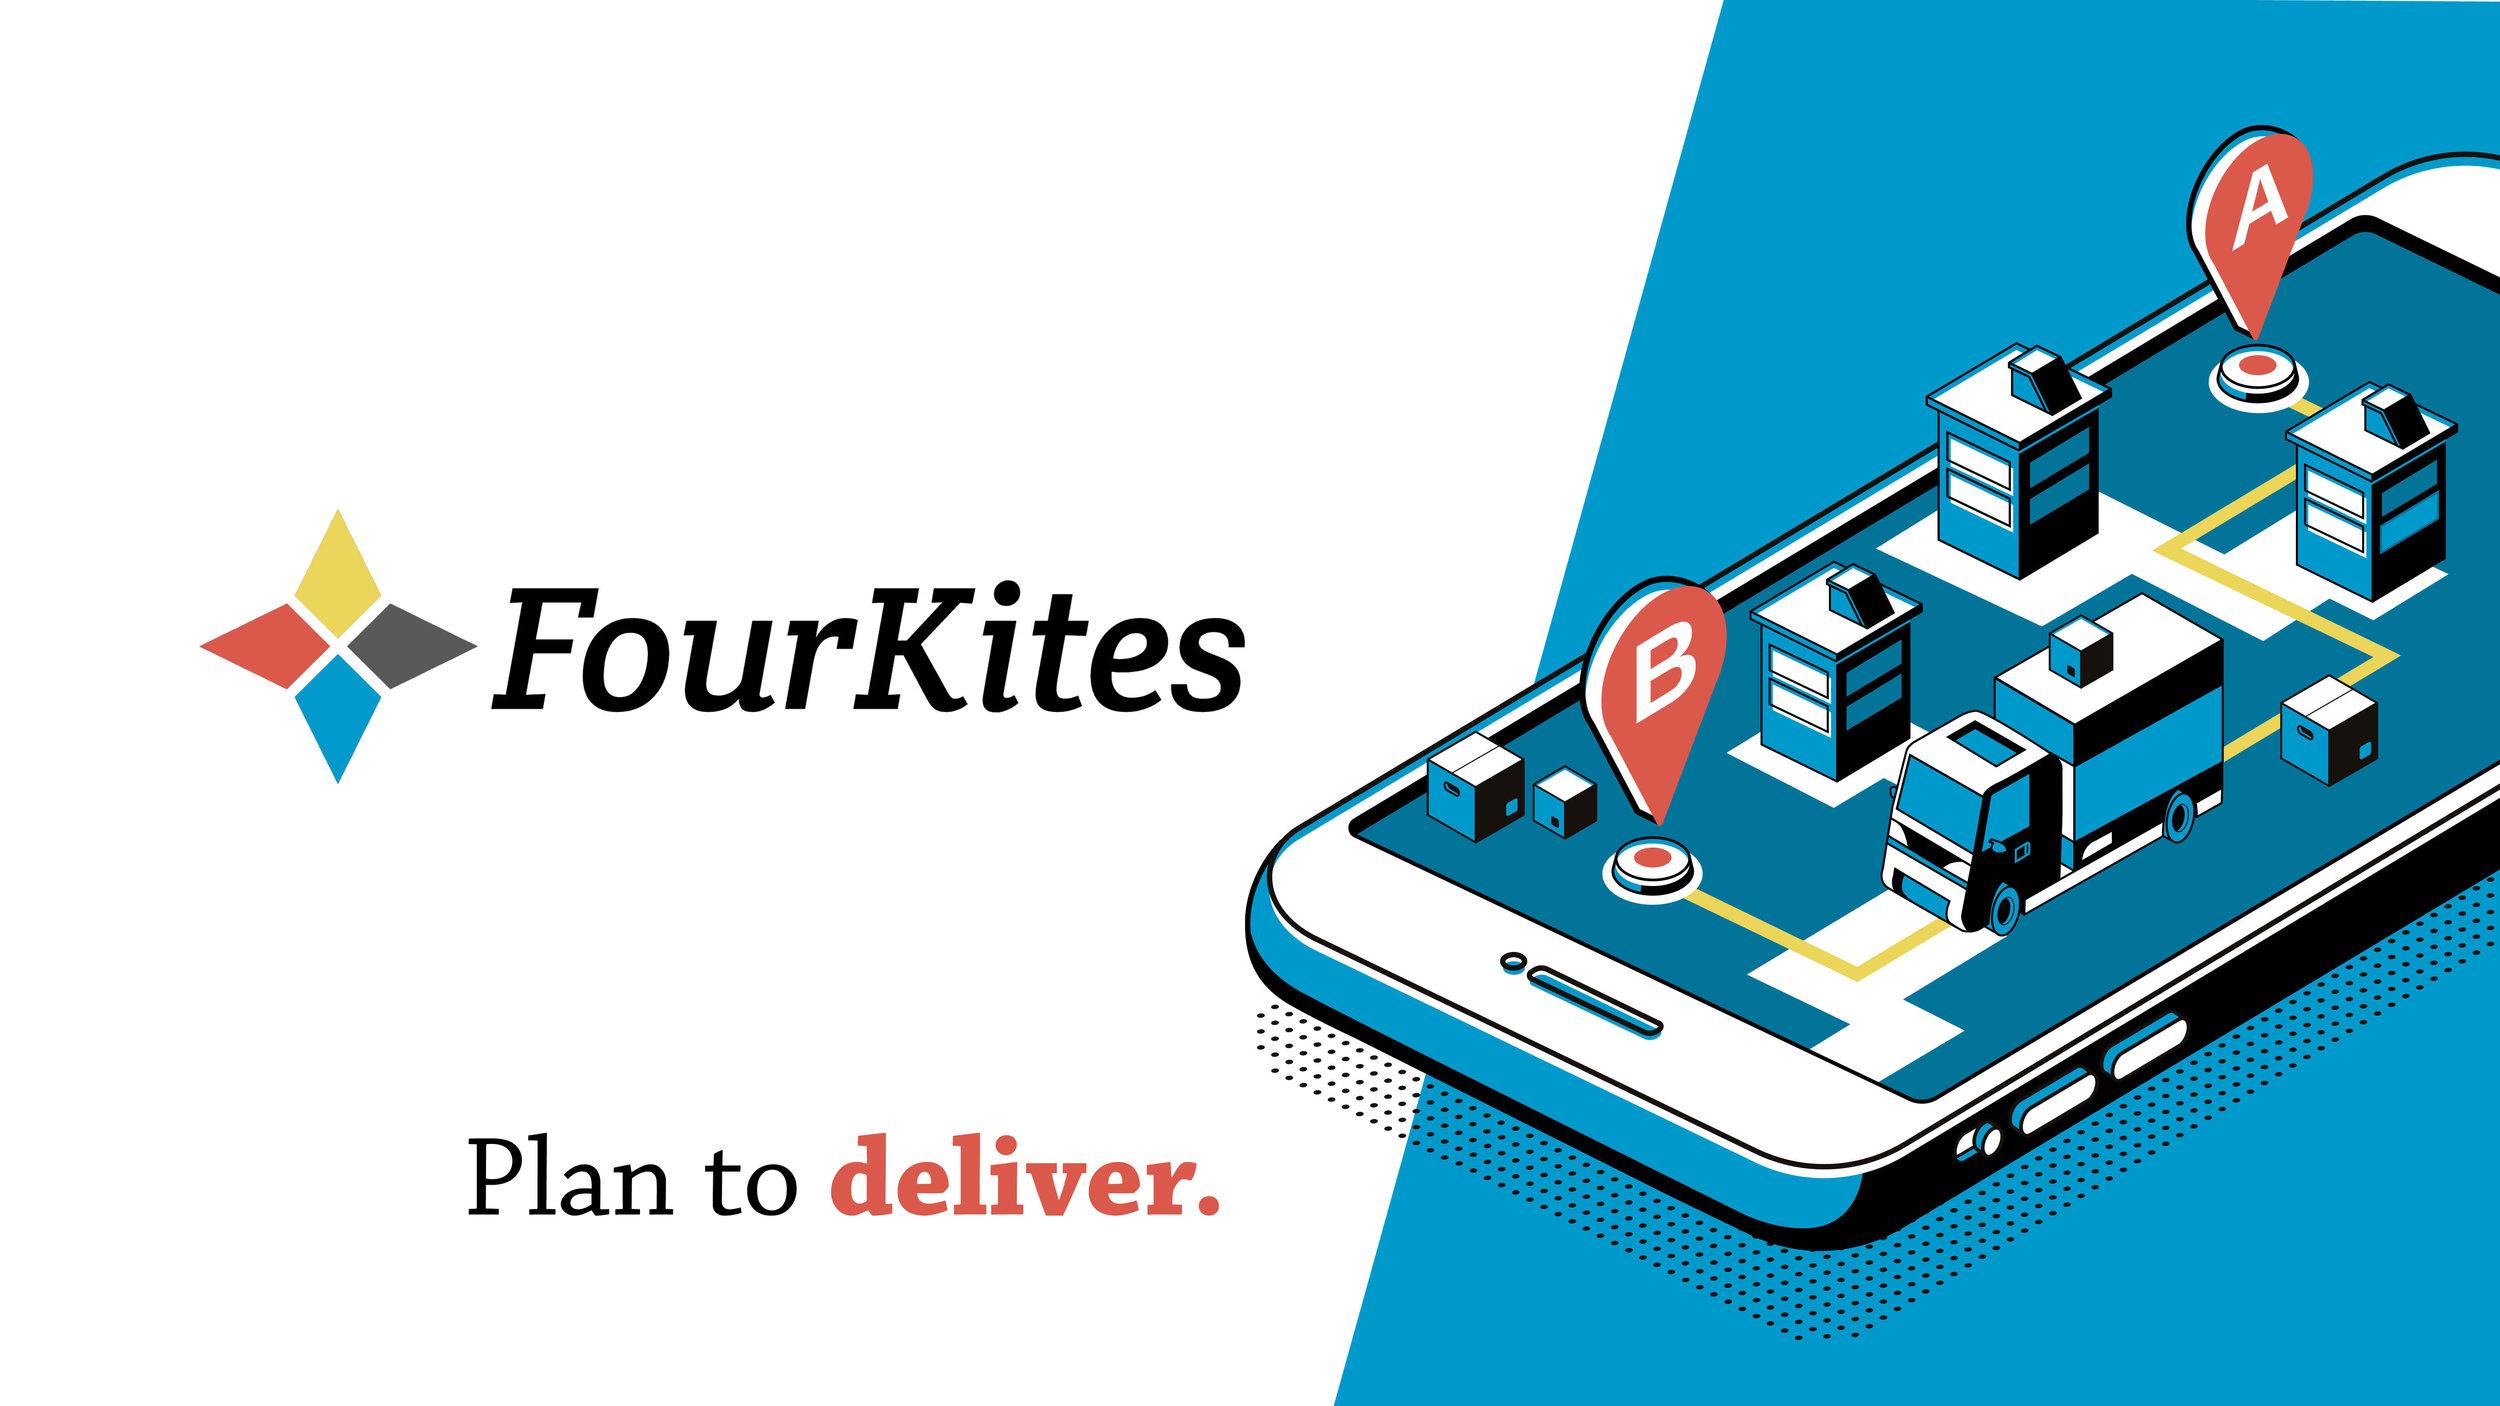 FourKites_deck_v1.jpg